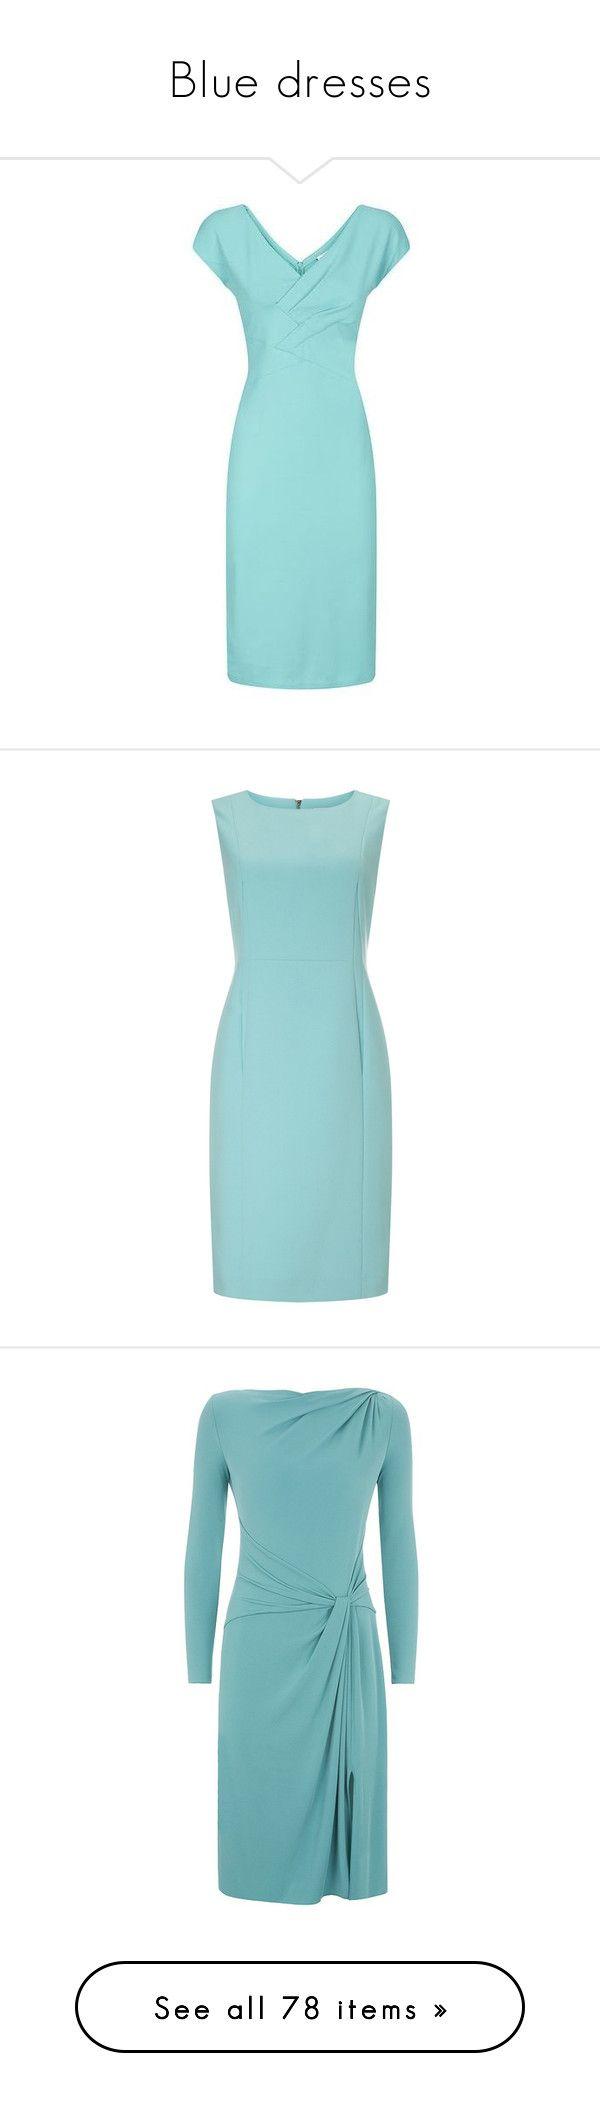 """Blue dresses"" by lorika-borika on Polyvore featuring dresses, blue jersey, blue draped dress, green jersey, draped dress, giorgio armani, petite, light blue dress, blue shift dress и shift dresses"